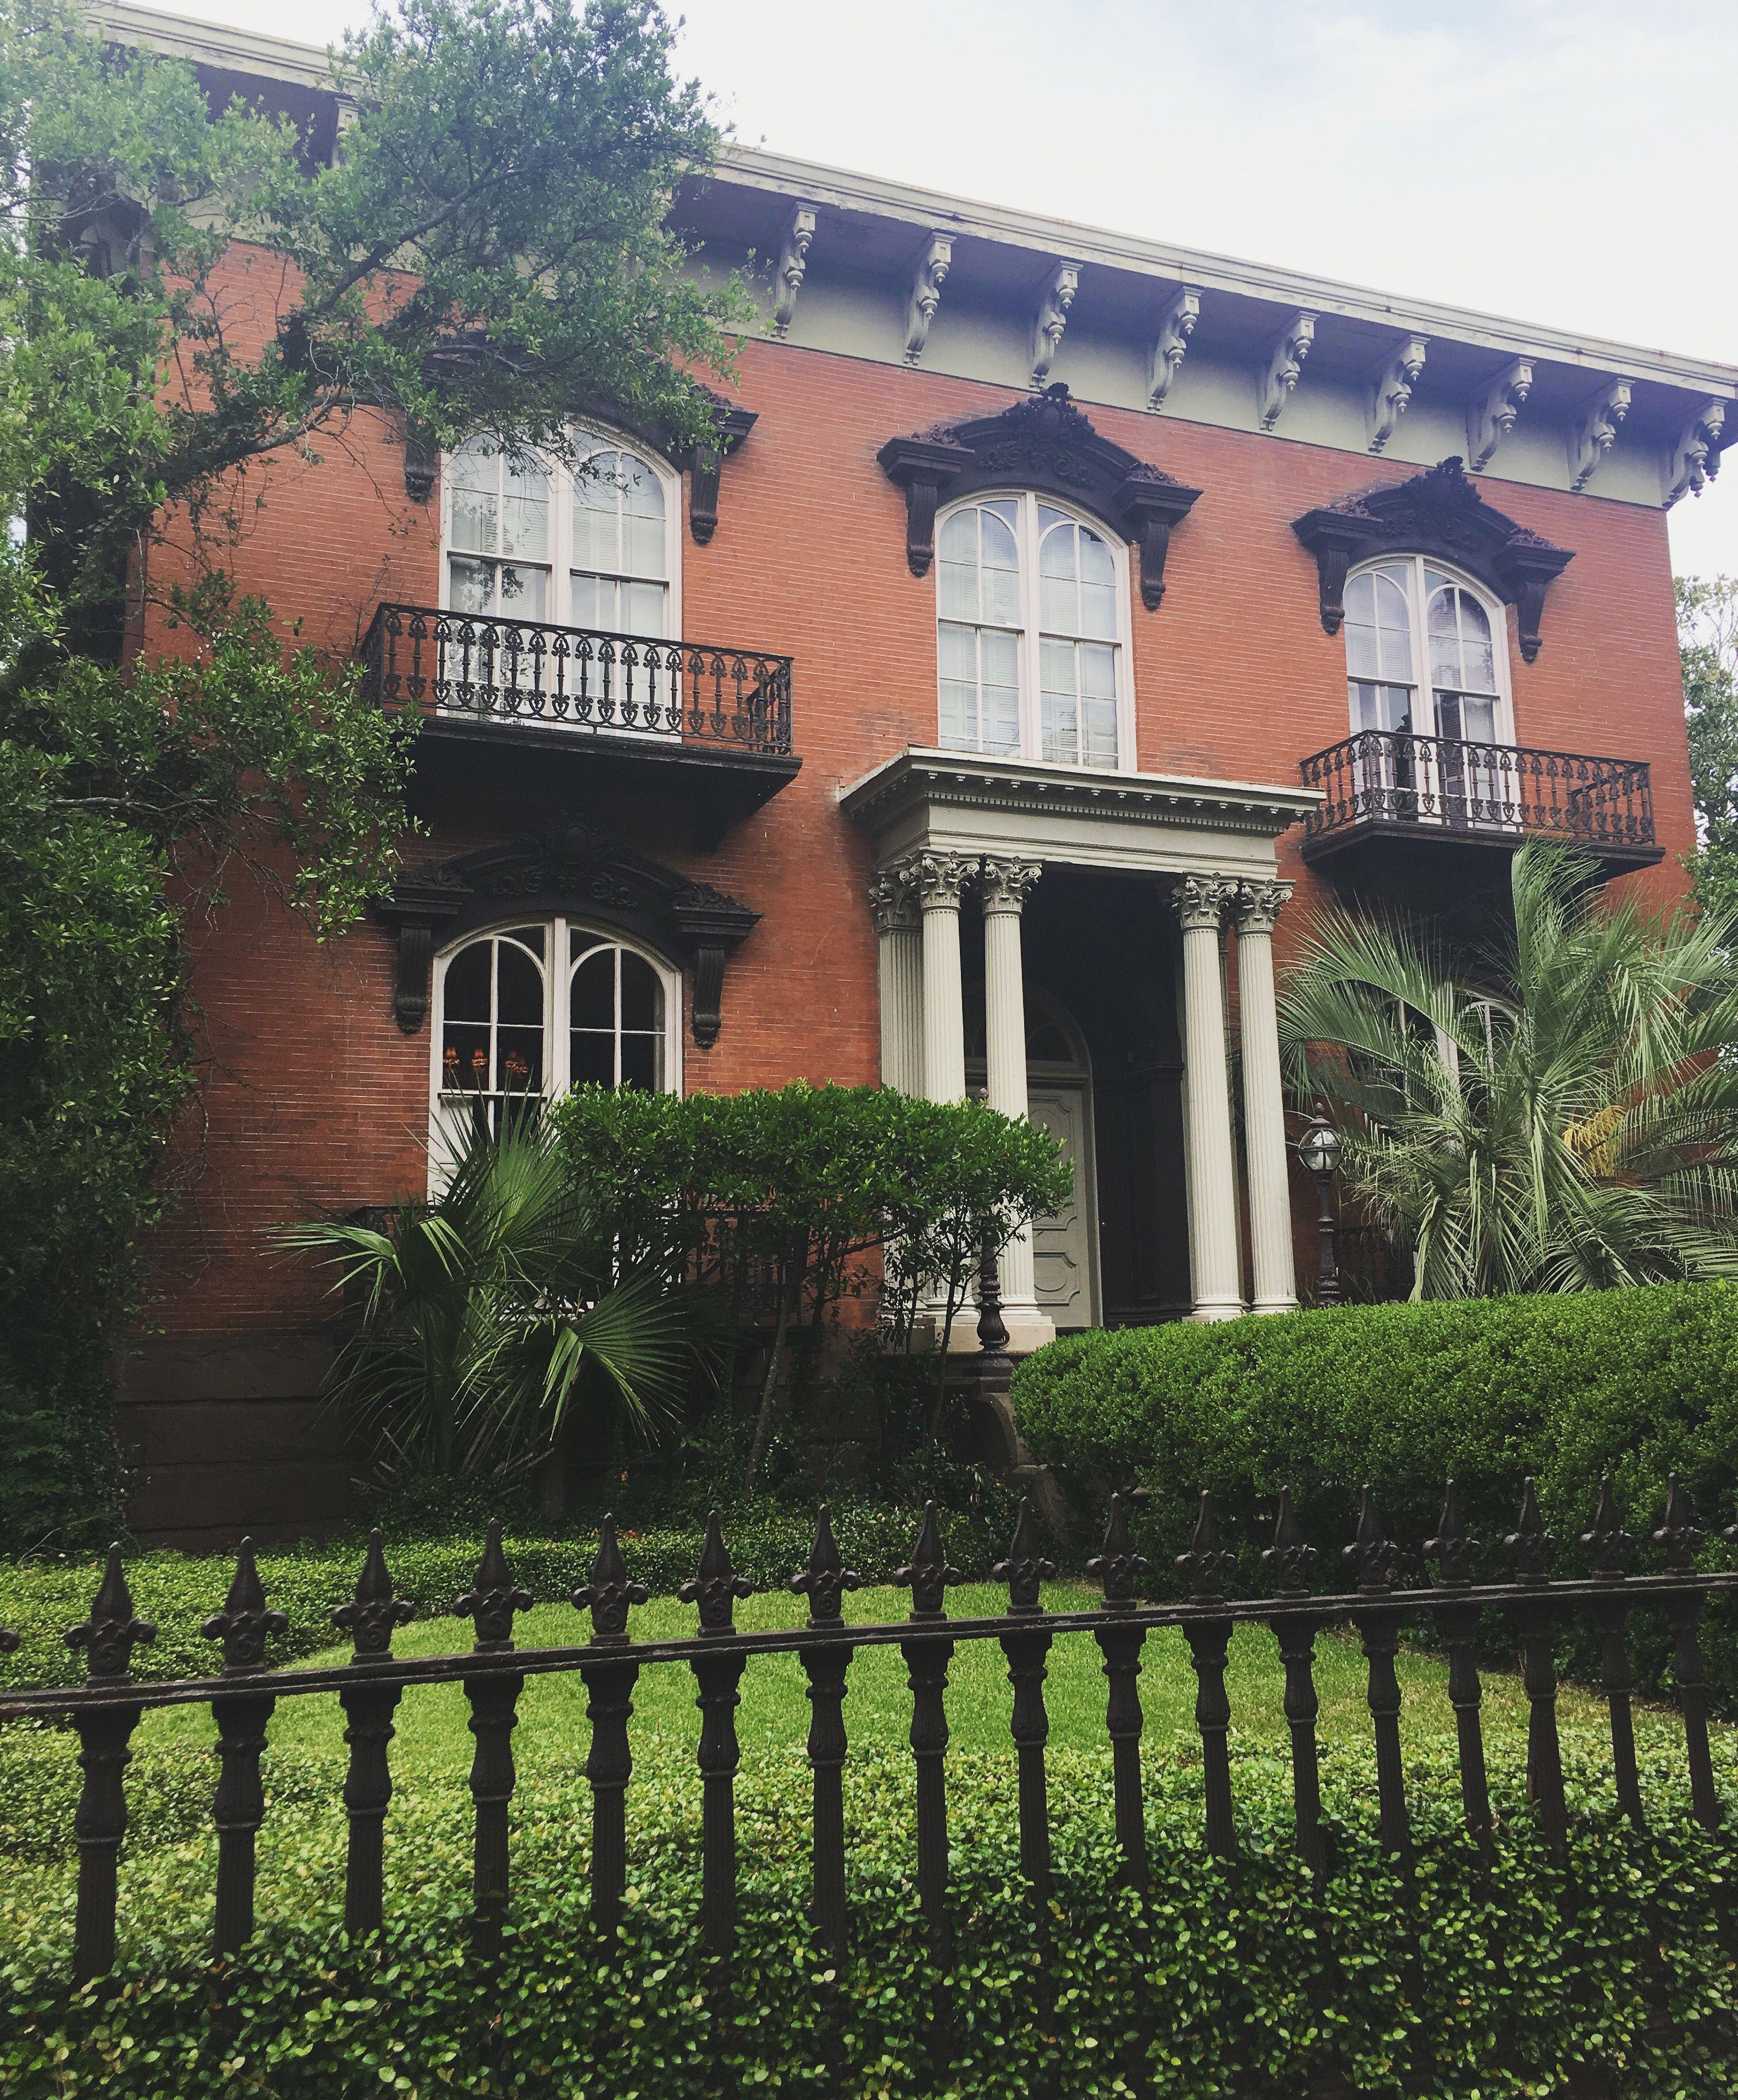 Mercer William House in Savannah, GA